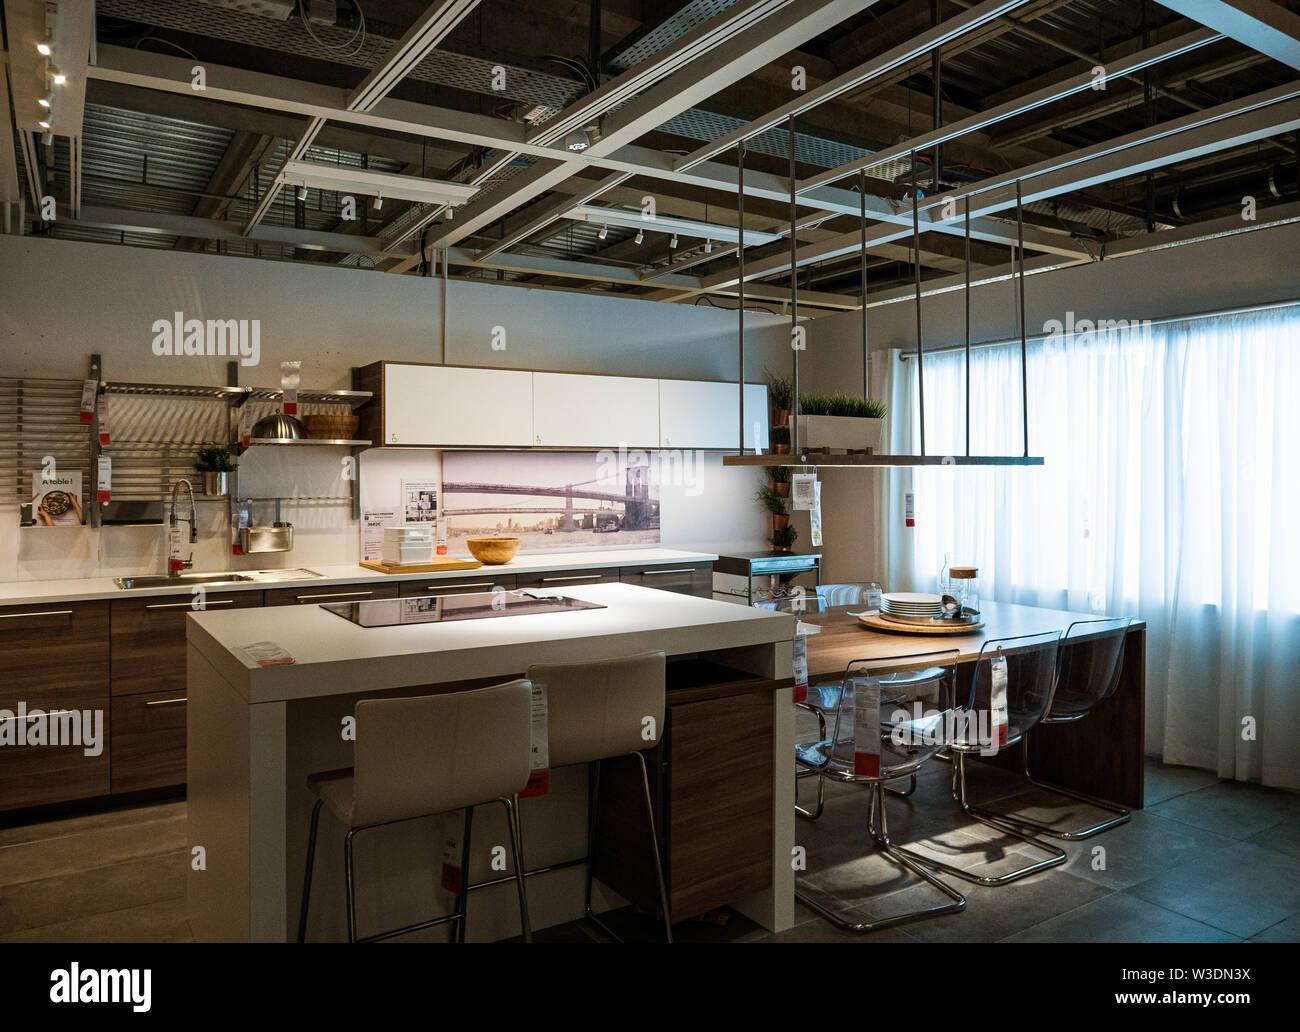 Ikea Table Stockfotos & Ikea Table Bilder - Seite 2 - Alamy